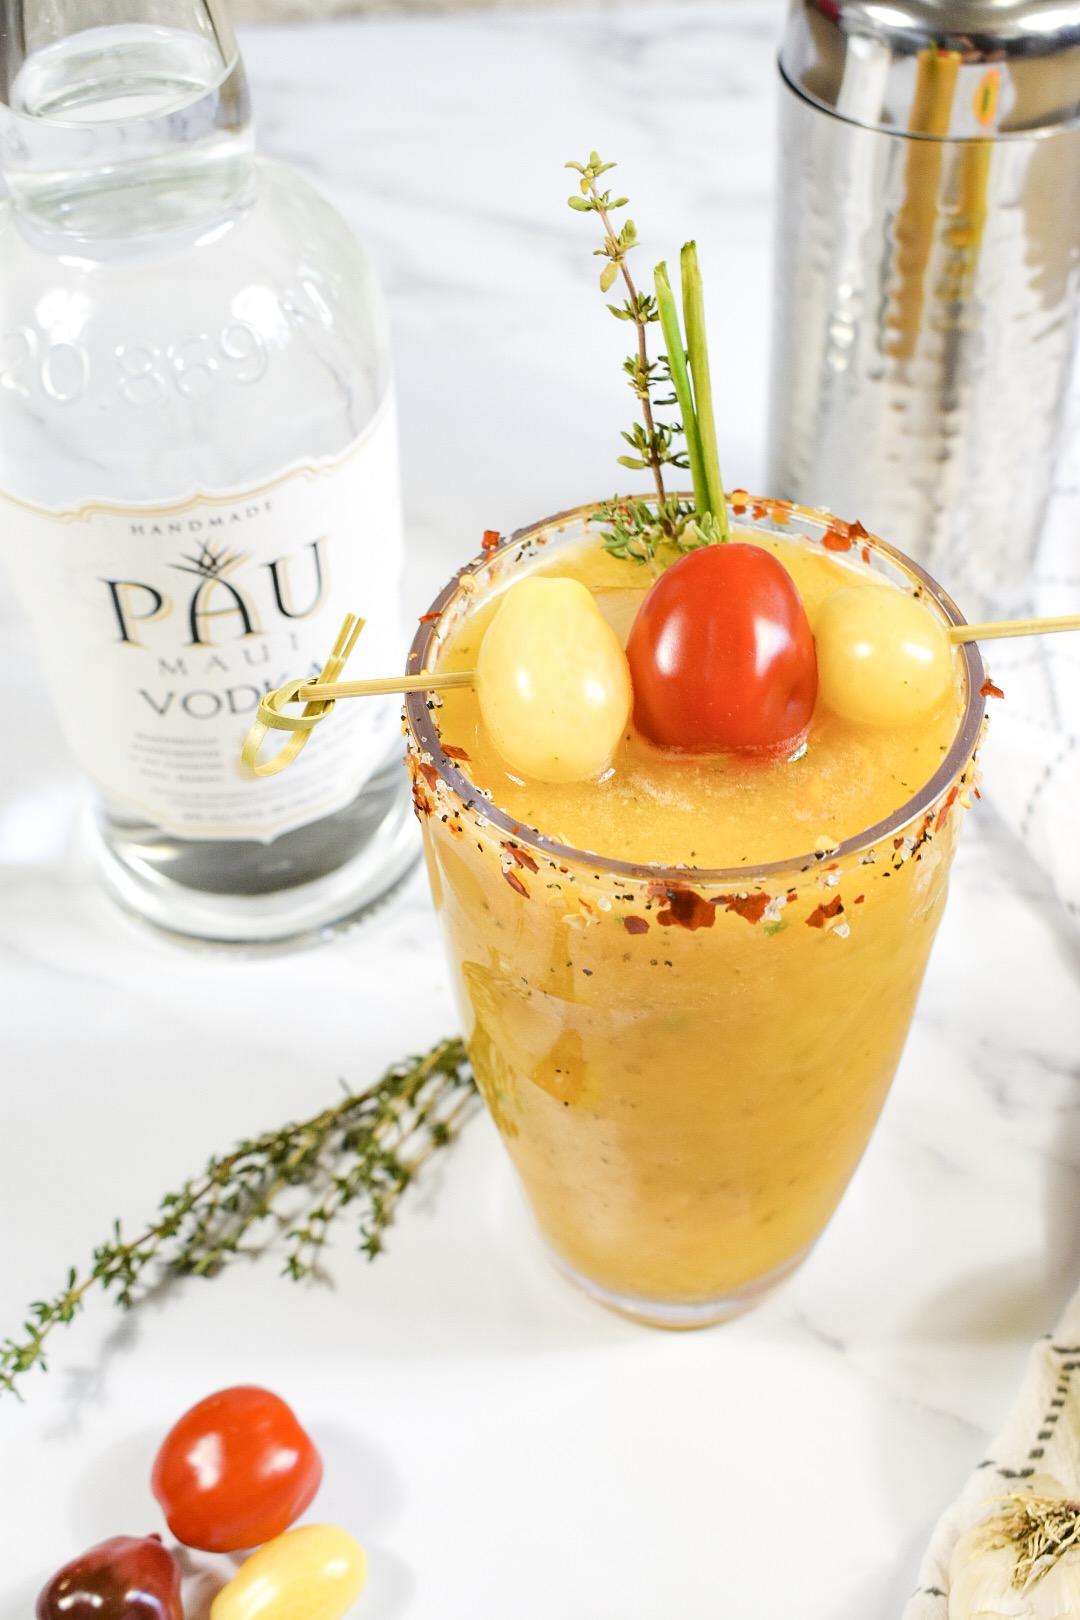 pau maui vodka fresh heirloom tomato bloody mary recipe bloody mary obsessed.jpg 3.jpg